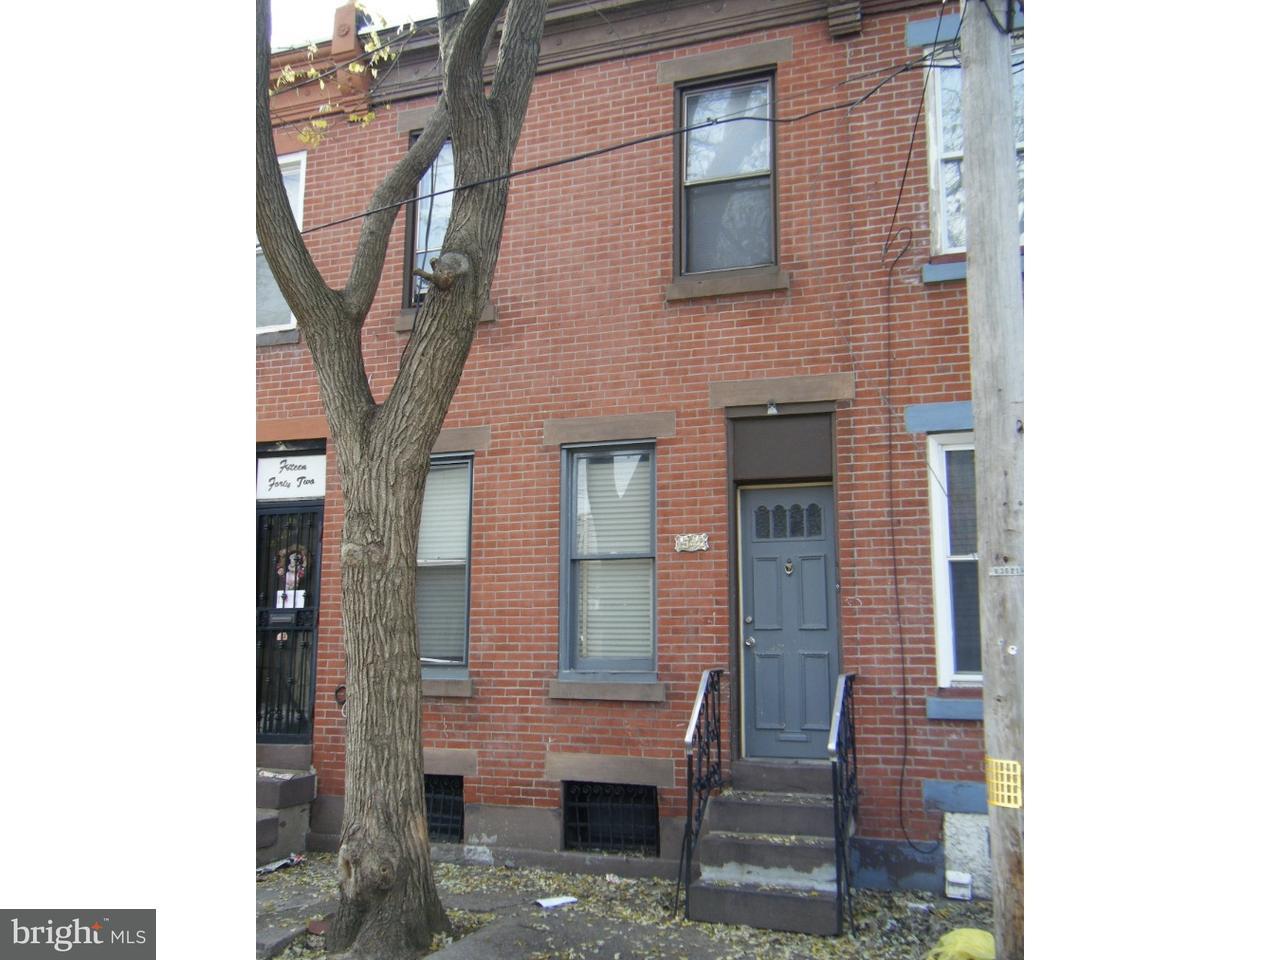 1540 S Bambrey Philadelphia, PA 19146